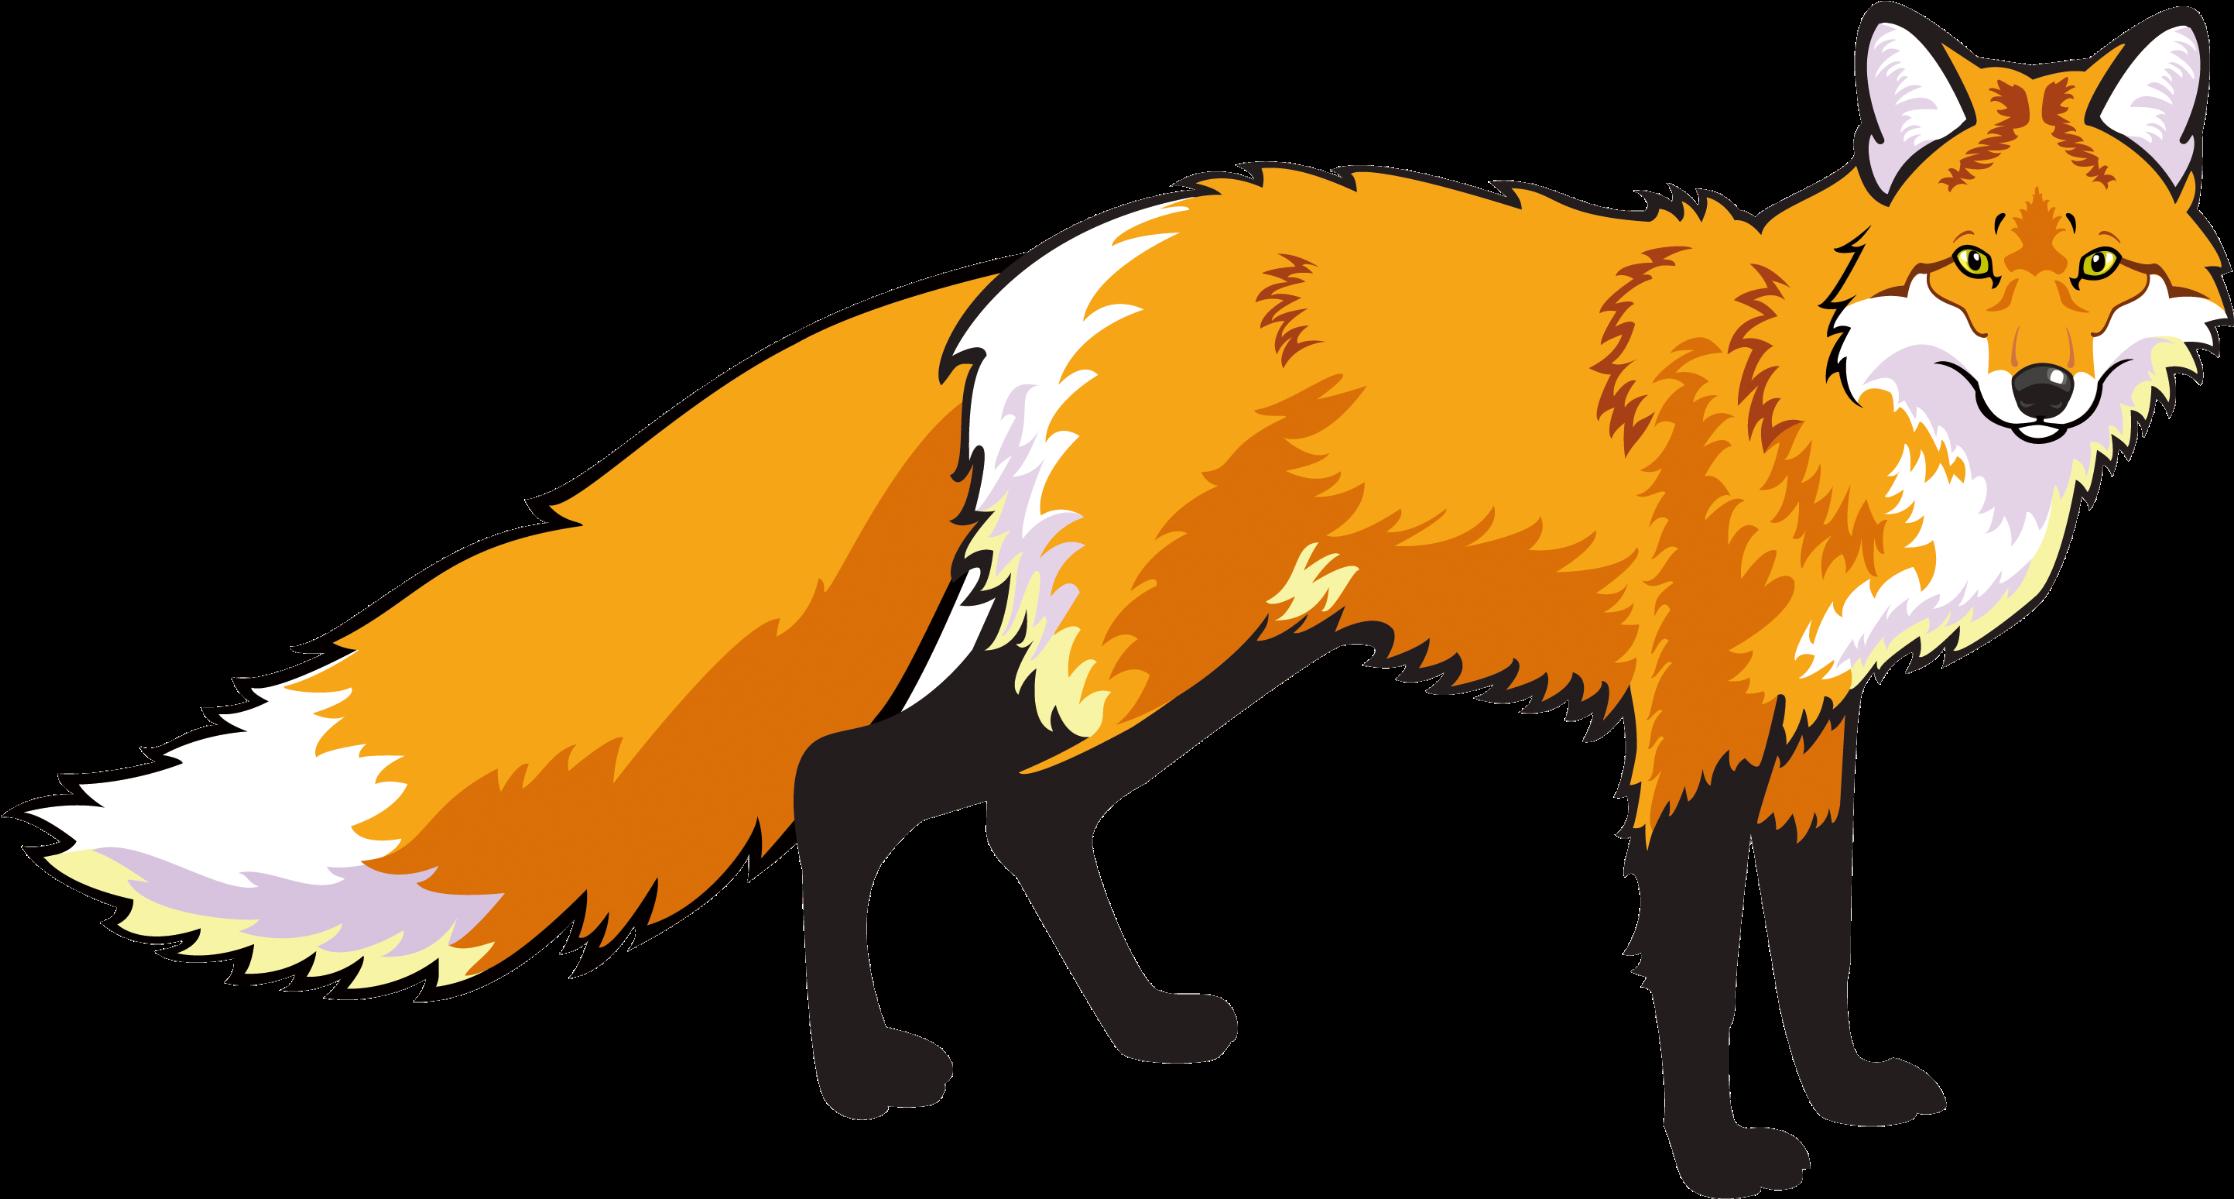 Transparent fox clipart - Red Fox Clipart Mammal - Лиса На Прозрачном Фоне